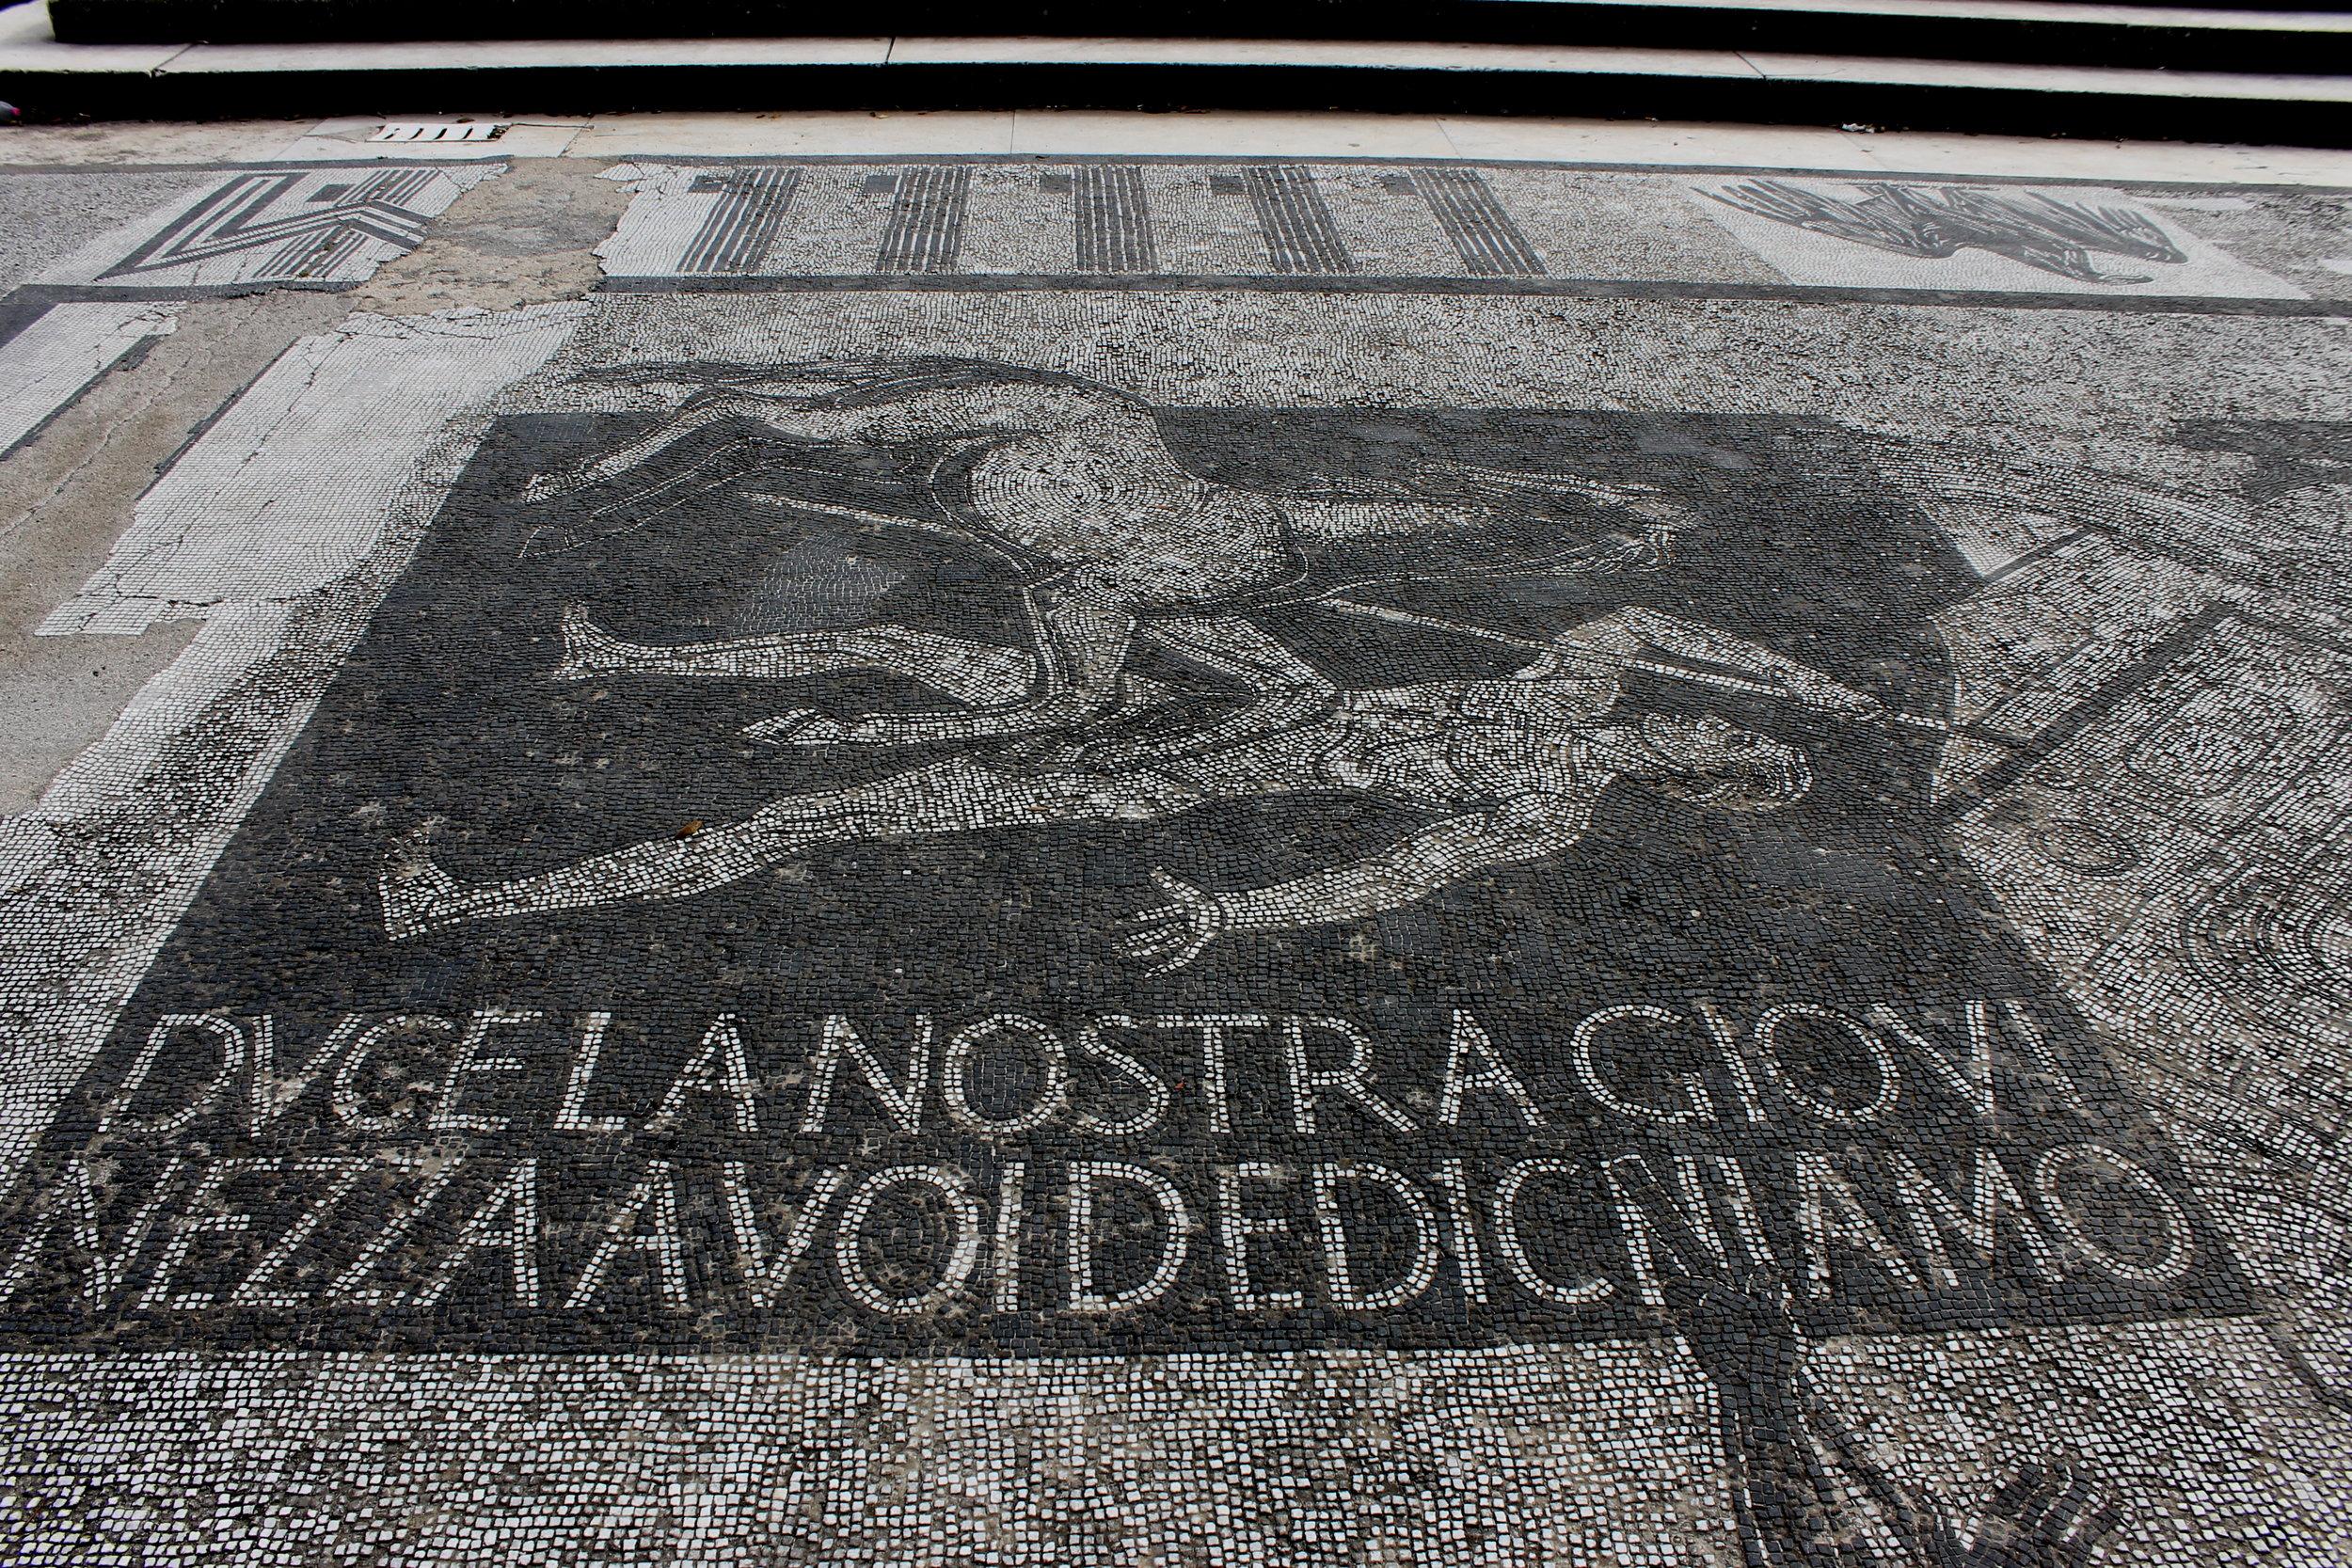 Foro Italico mosaic.